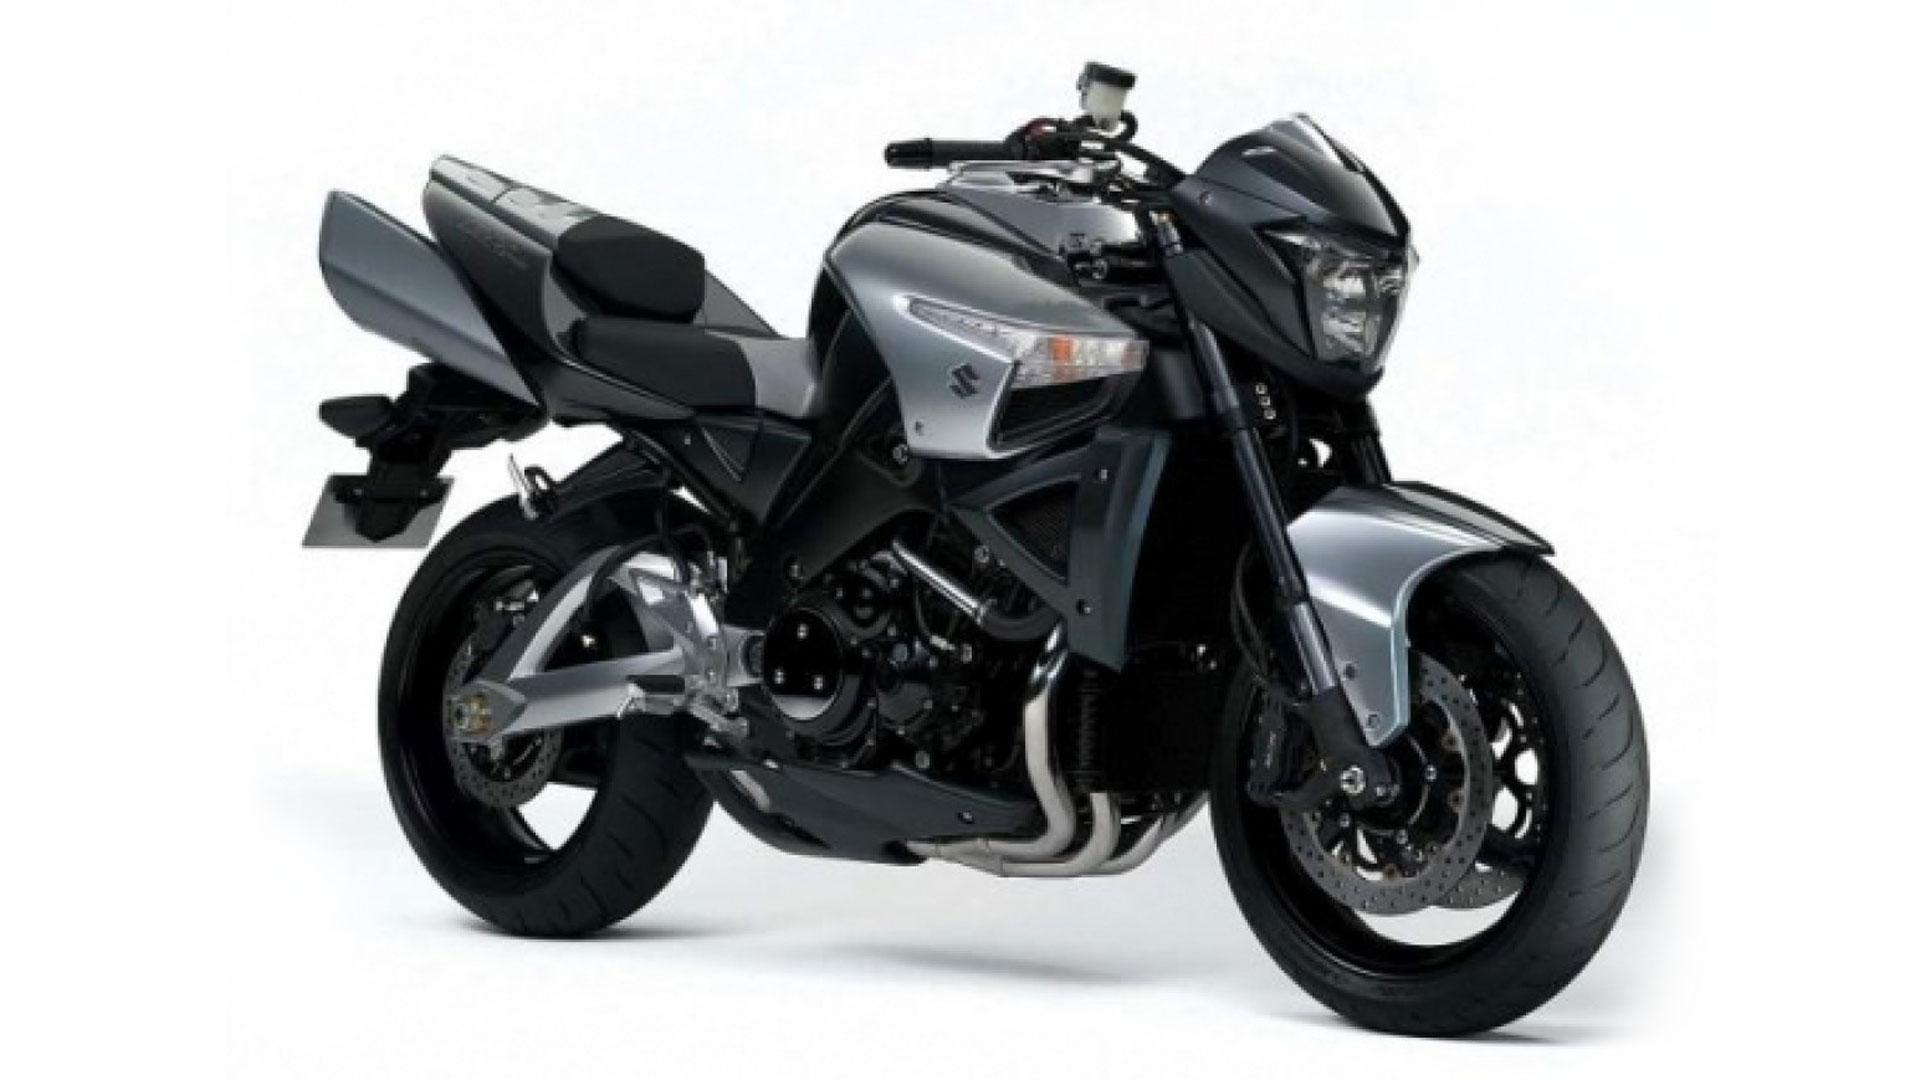 2007 Suzuki B-King